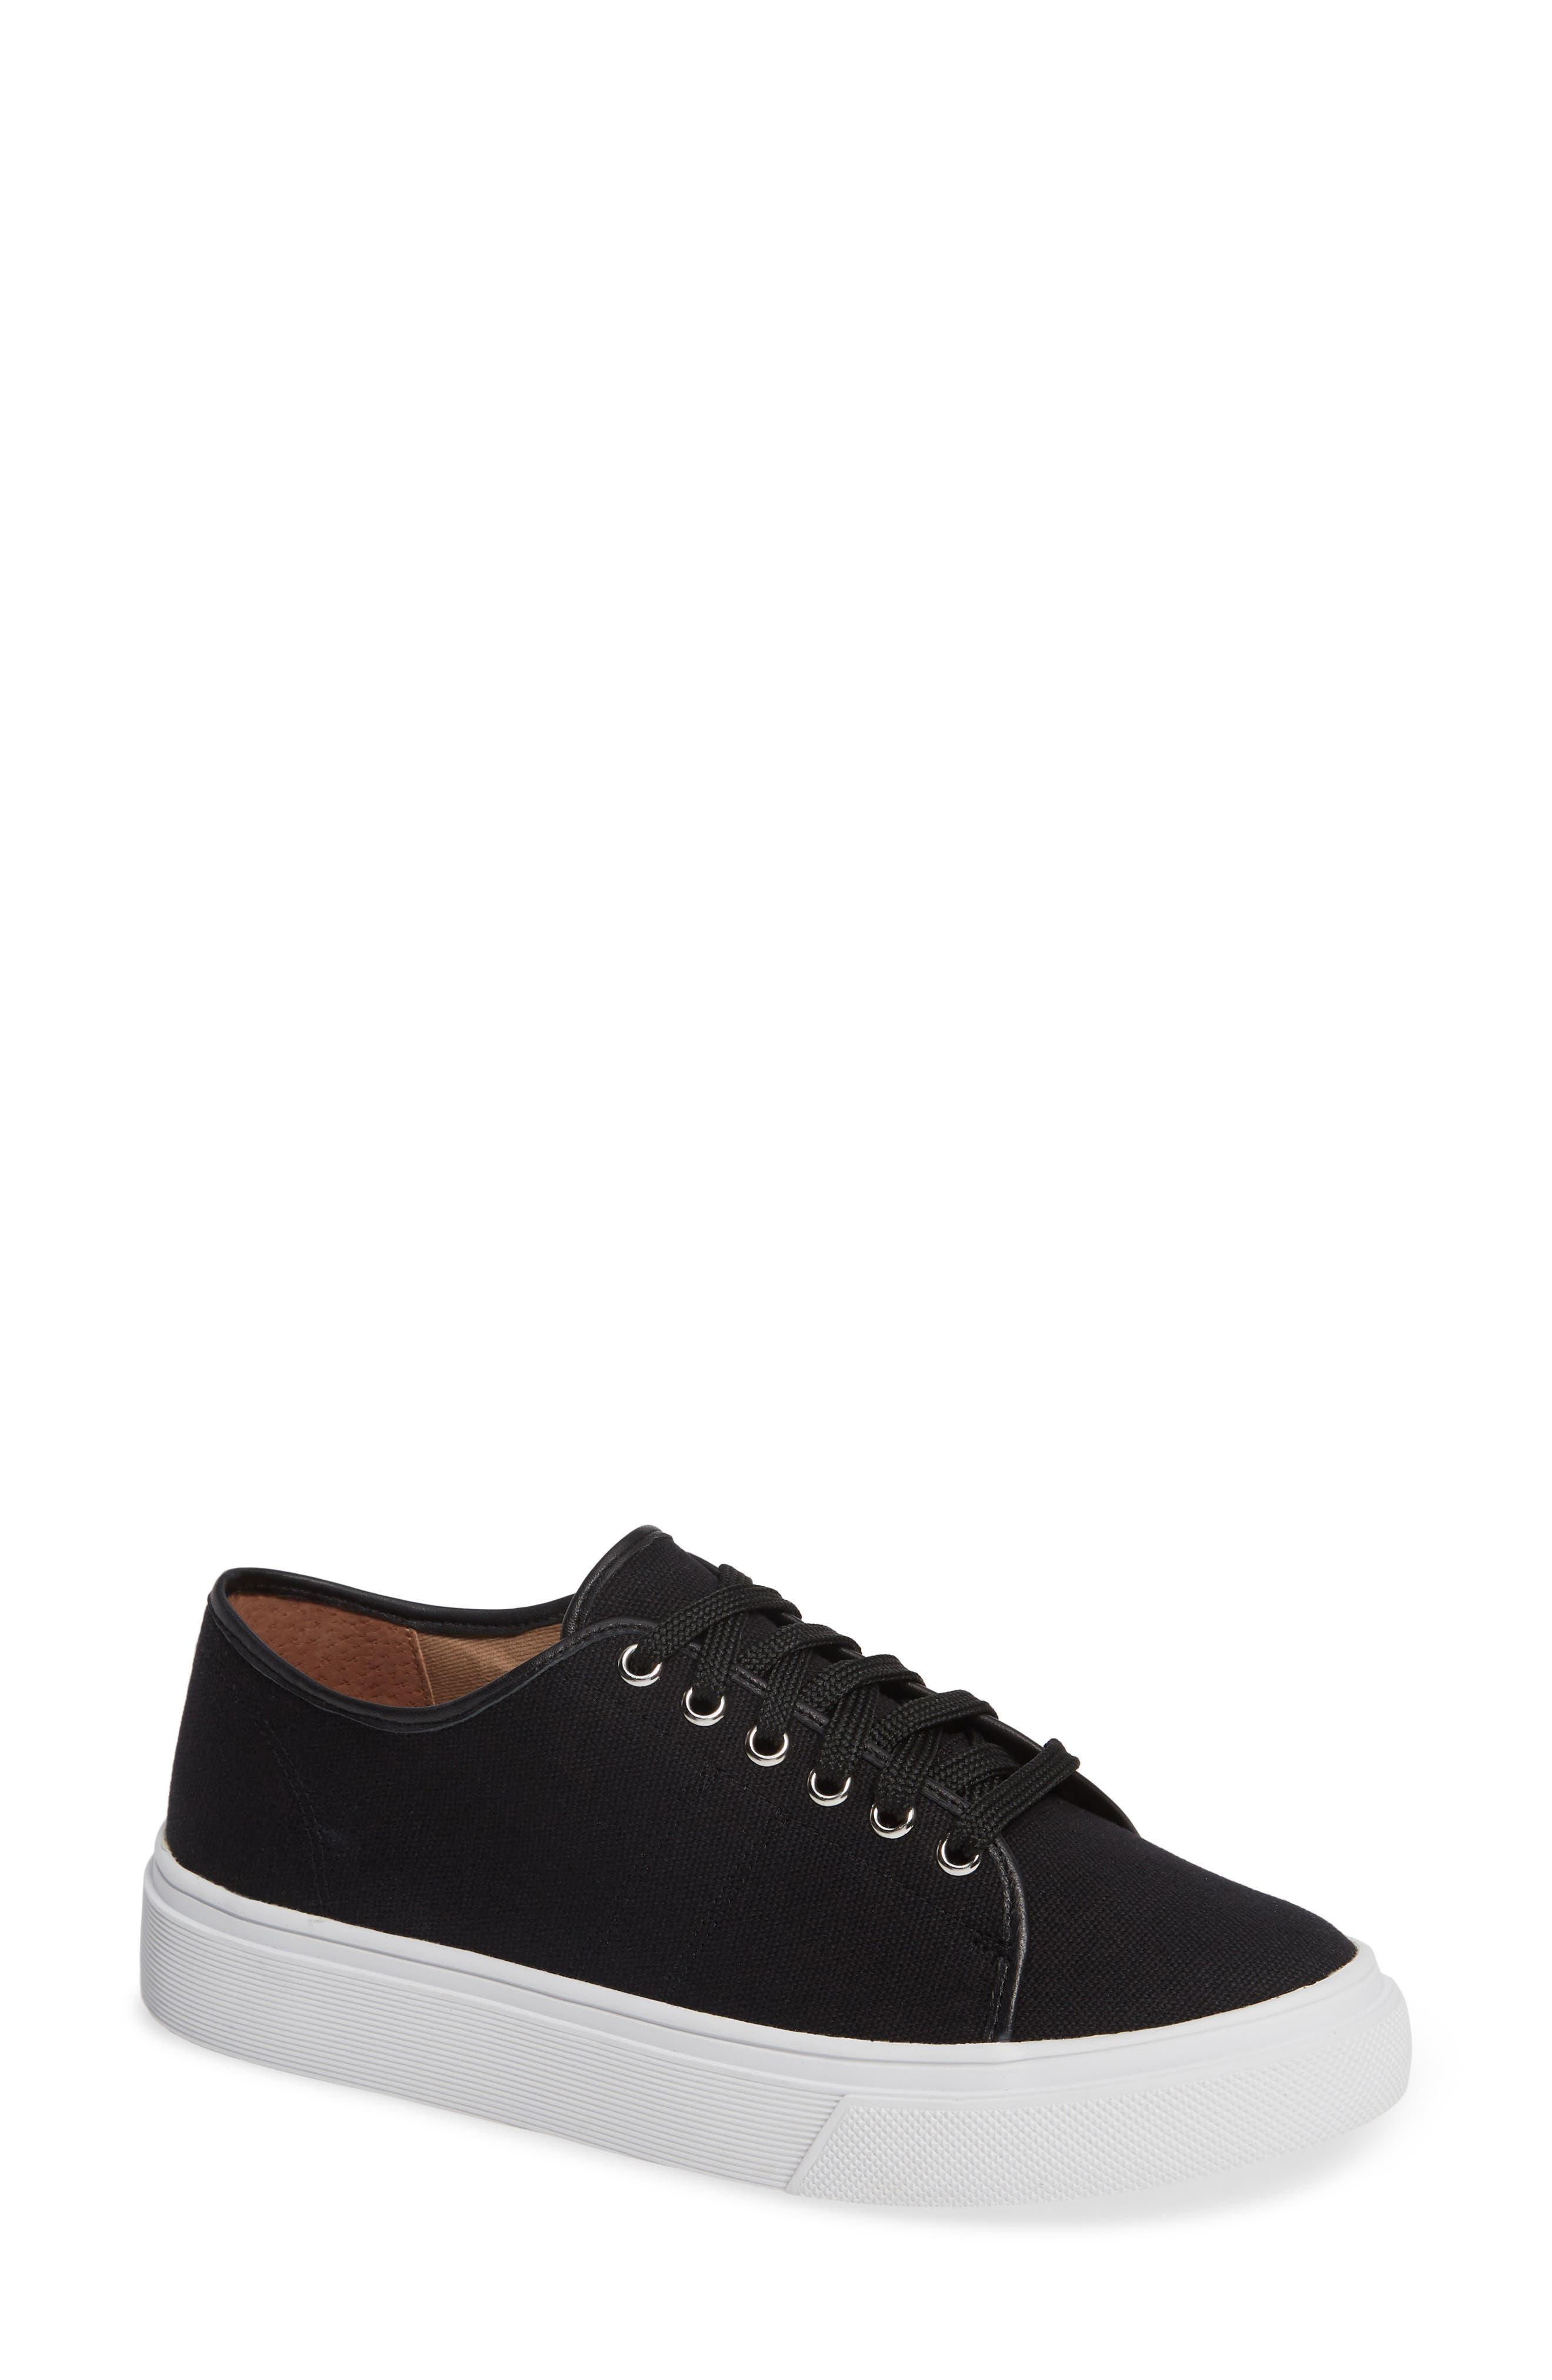 0ee18ad1caca2 Women s Caslon® Shoes